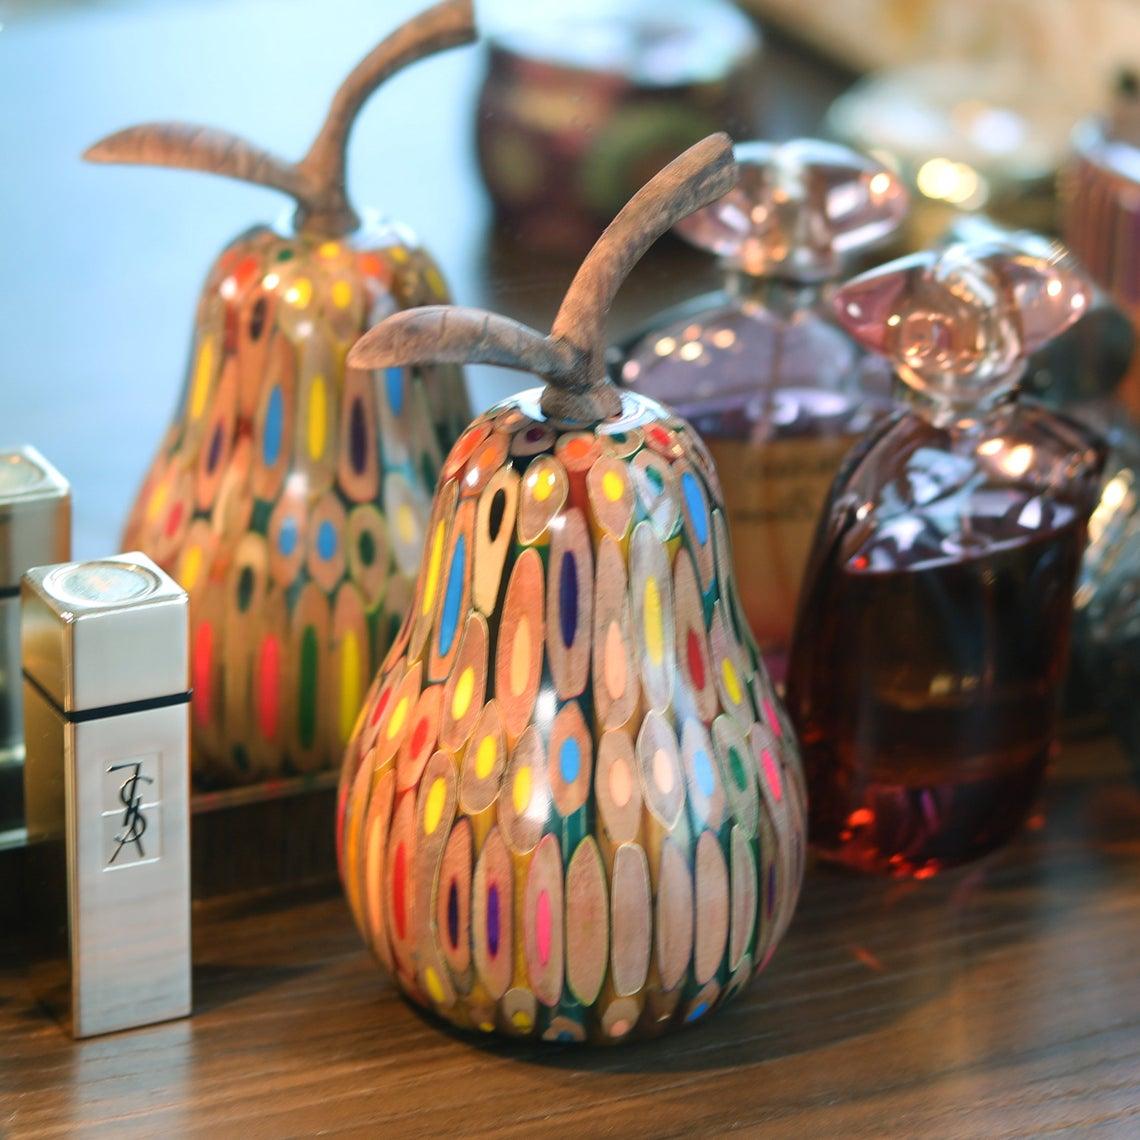 Decorative Wooden Colored-pencil Lovebirds Pear